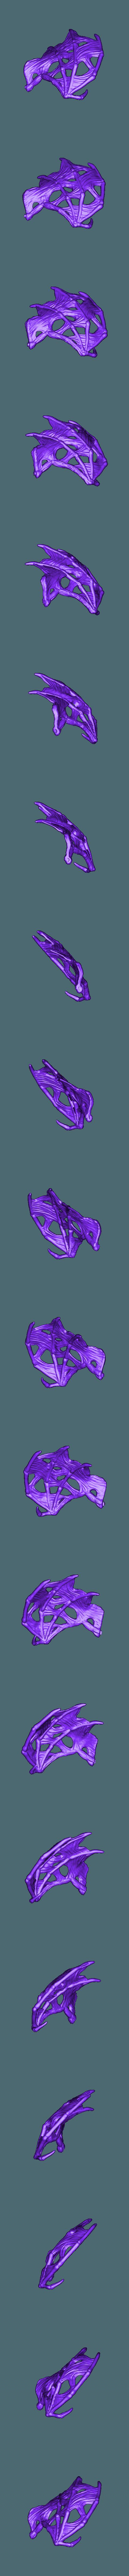 undead_dragon_left_wing.stl Download free STL file Undead dragon • 3D print model, schlossbauer